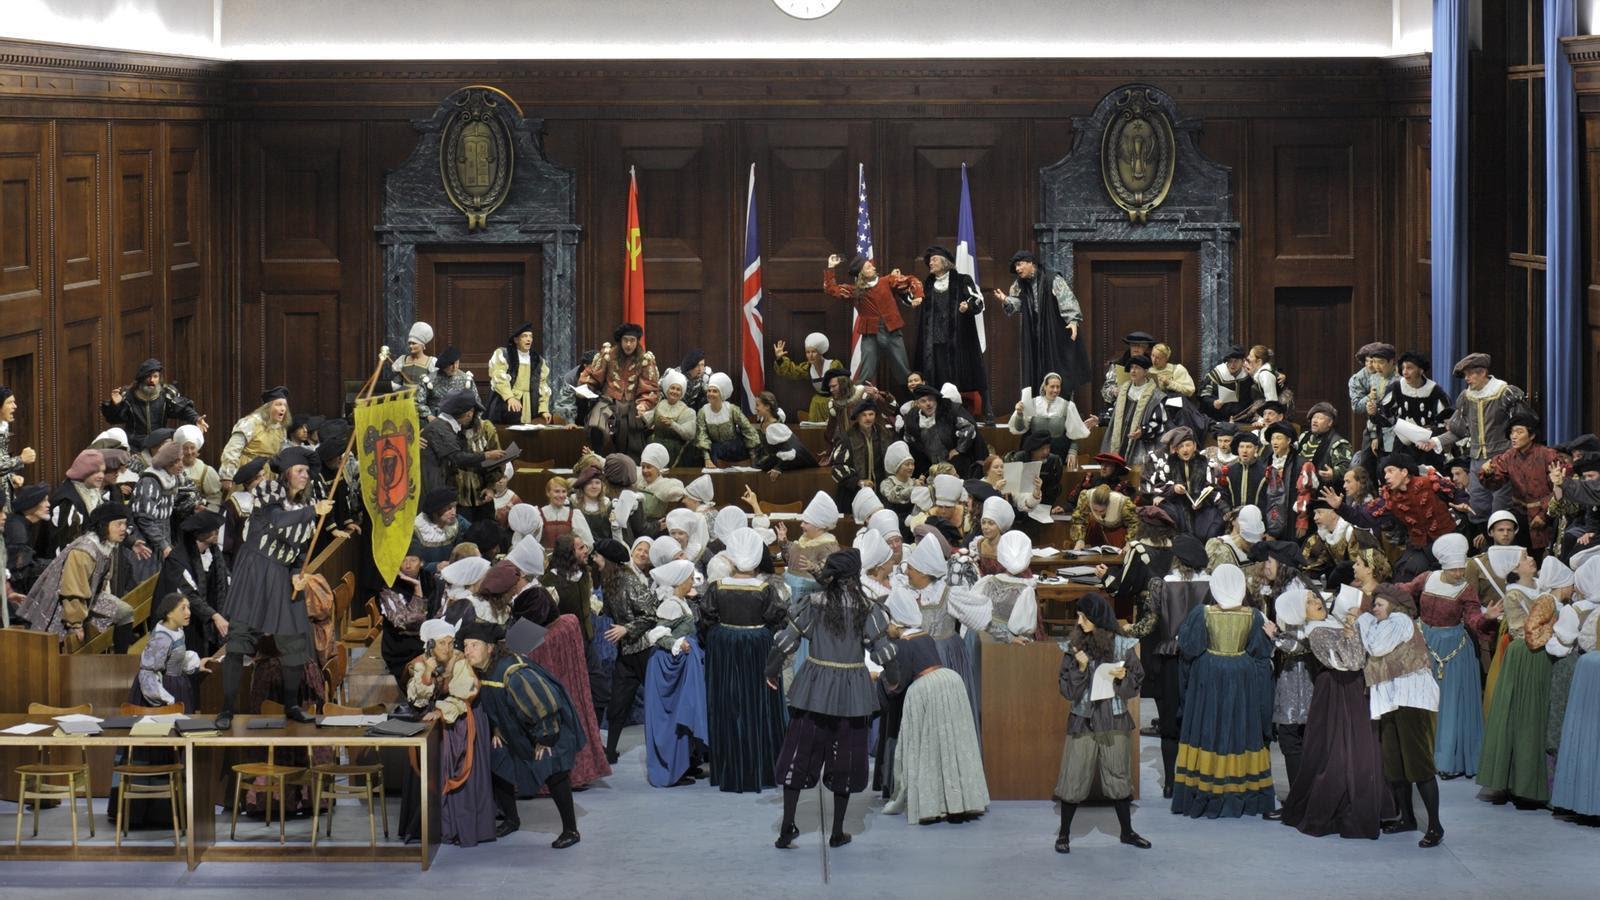 'Els mestres cantaires de Nuremberg' / Enrico Nawraht / Bayreuther Festspiele